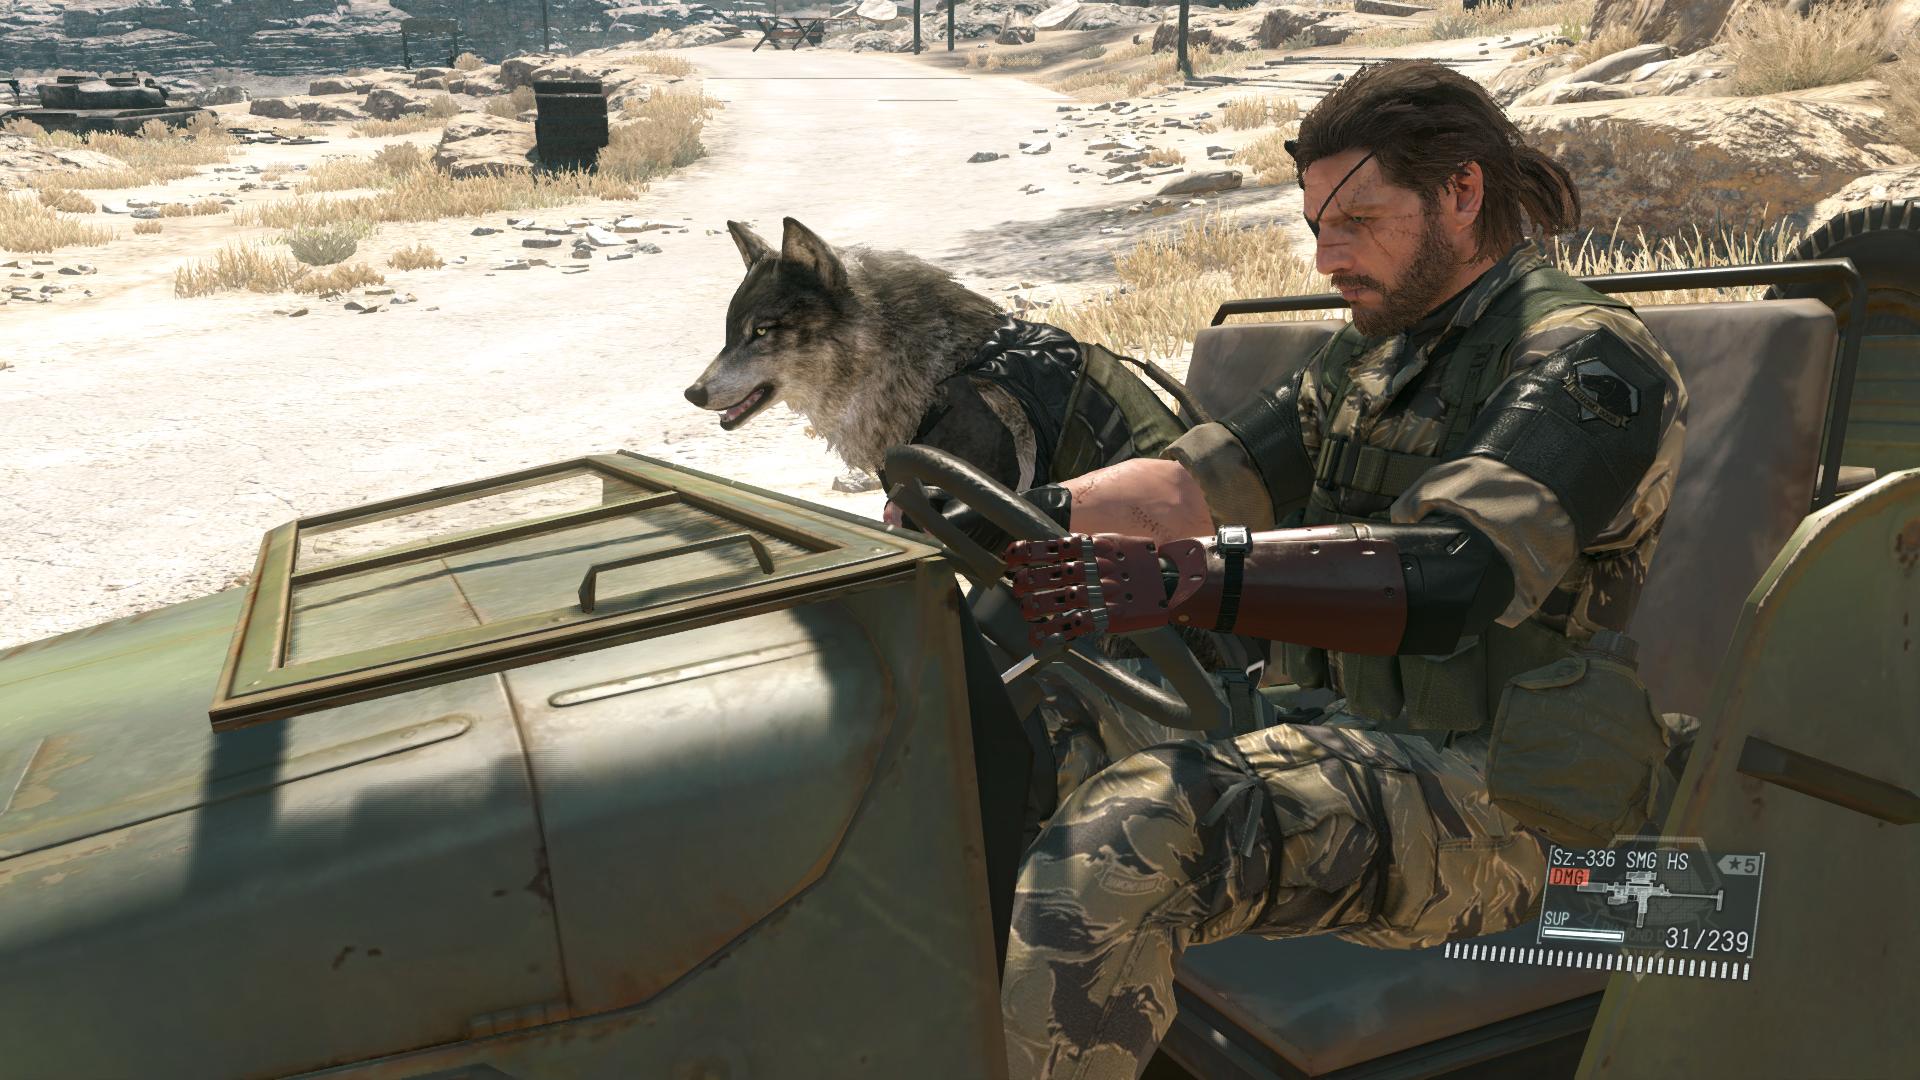 Metal Gear Solid V: The Phantom Pain image 2